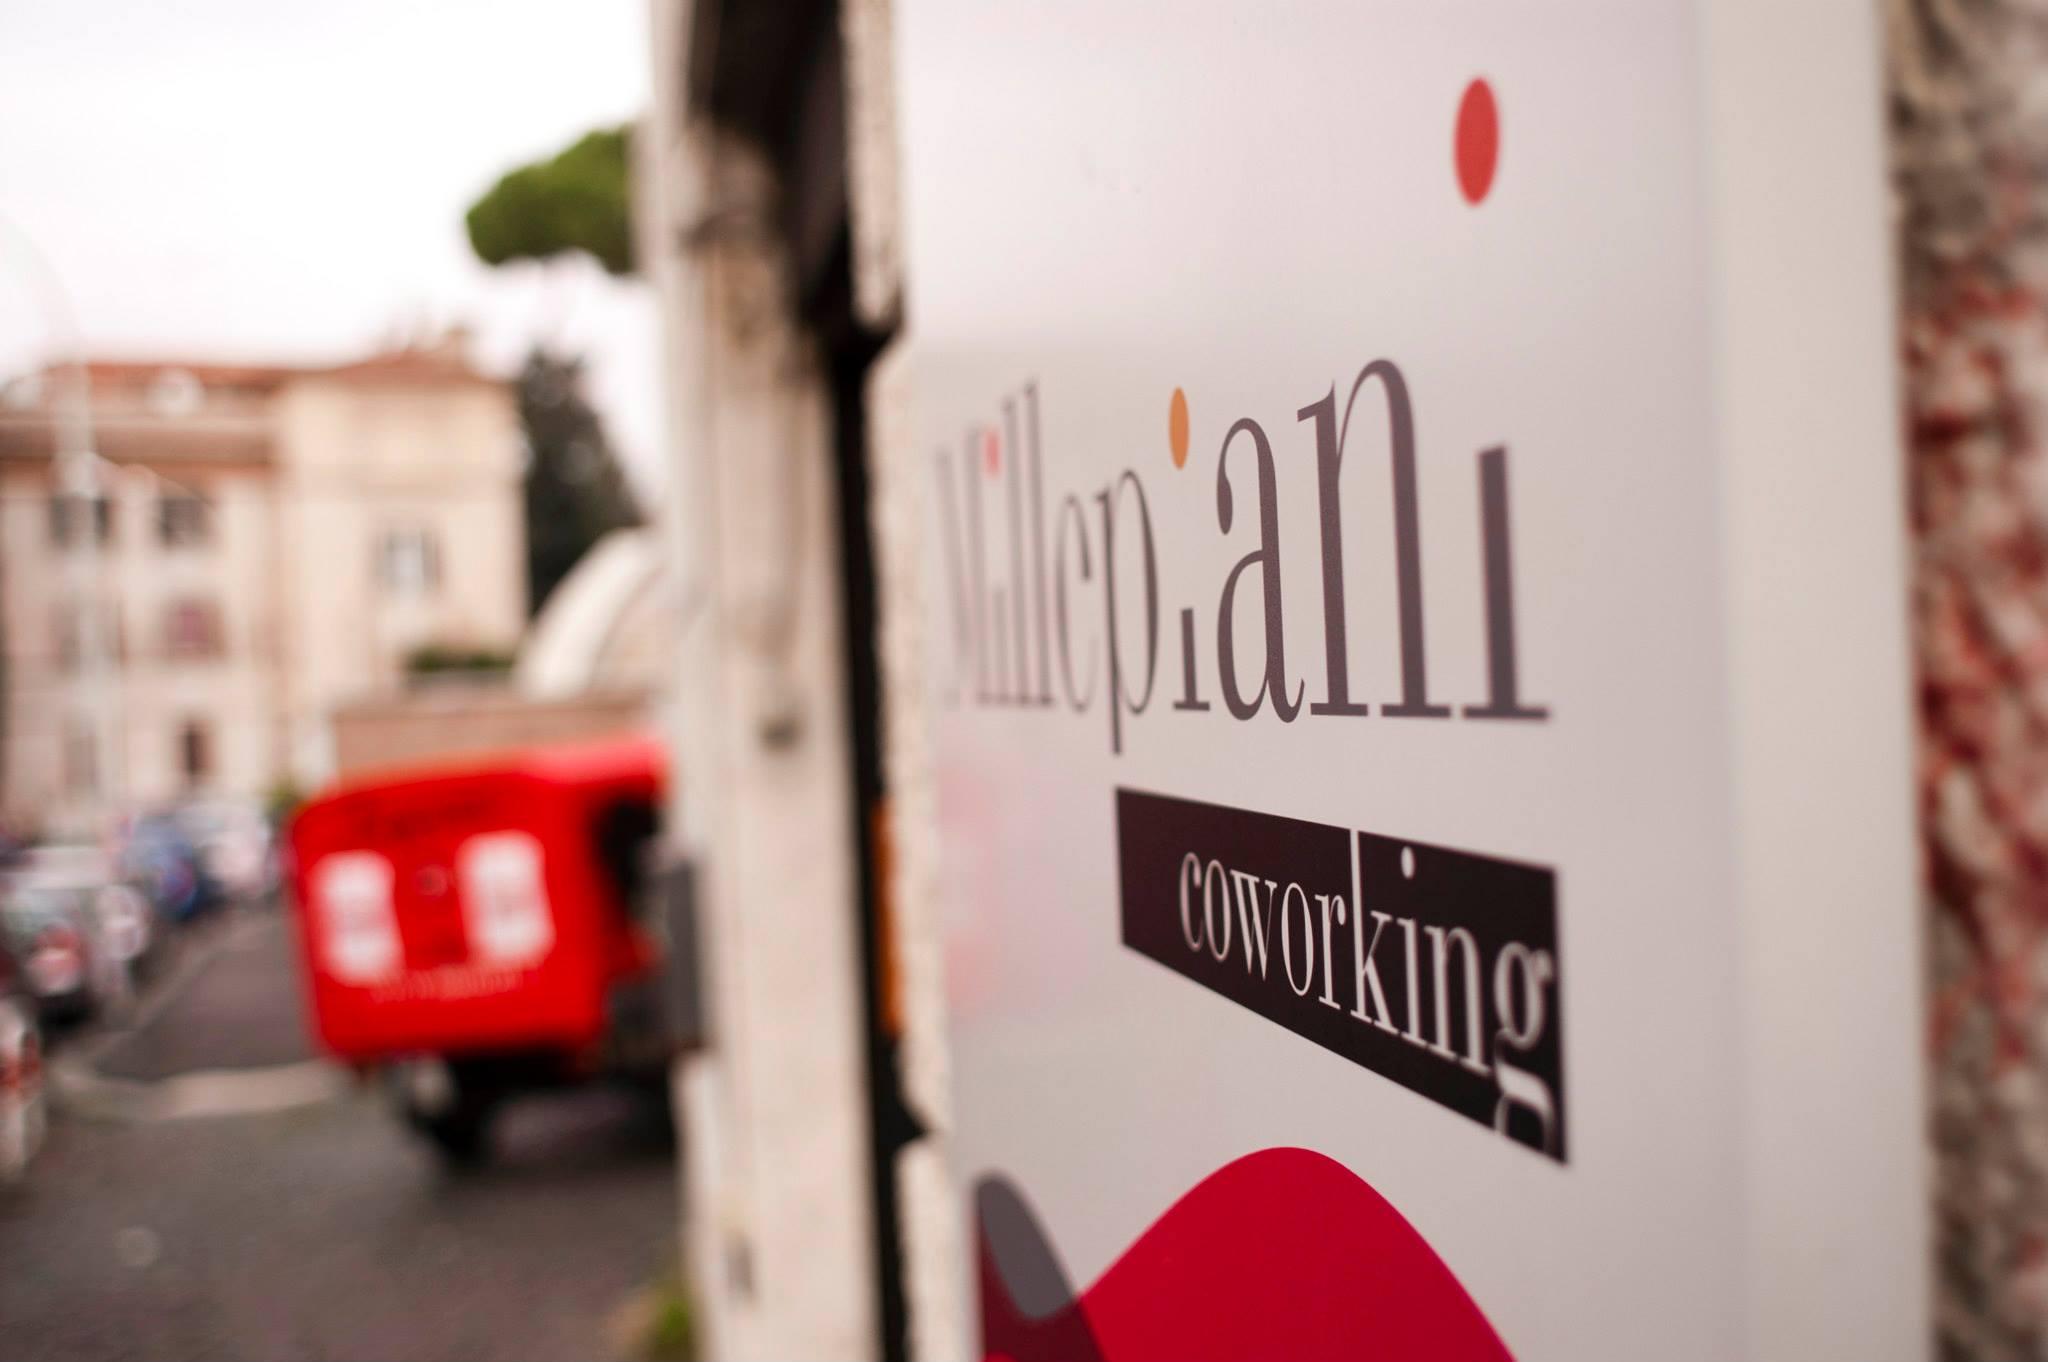 Millepiani Coworking, Rome